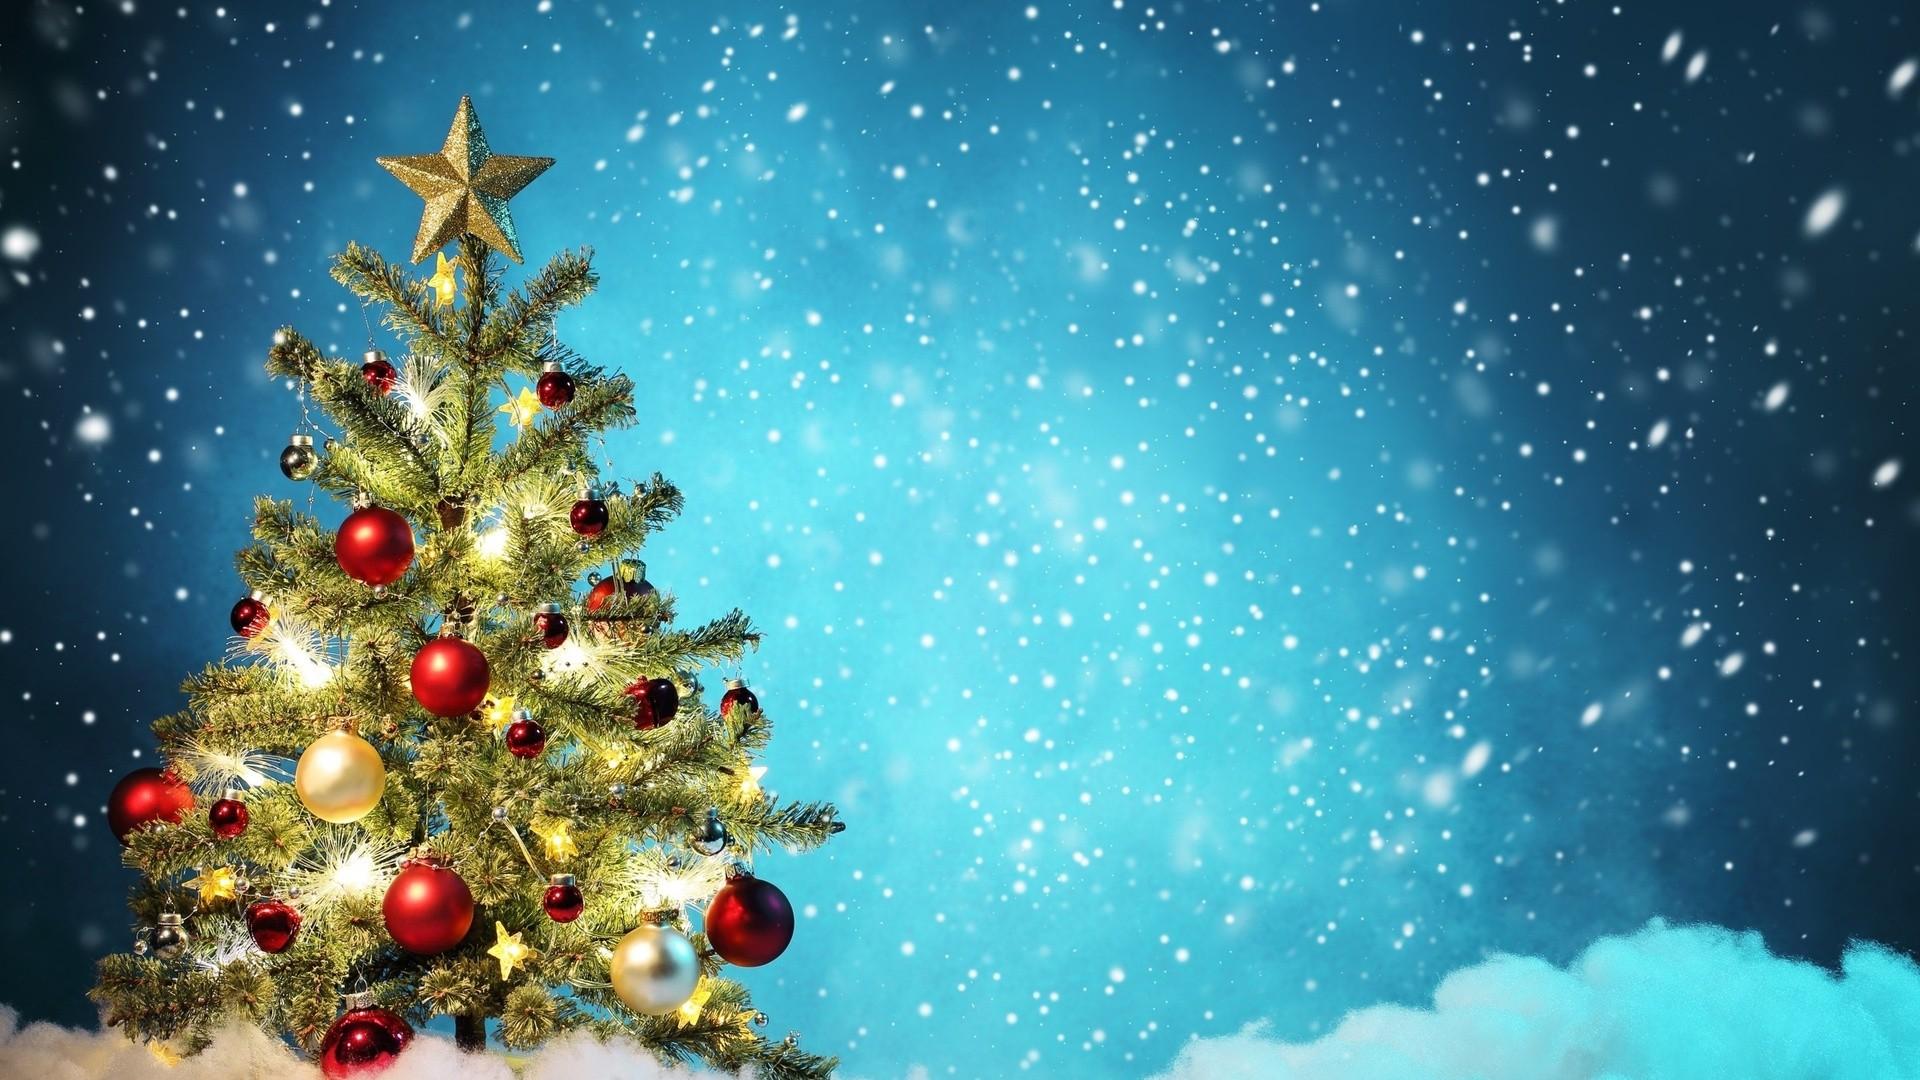 Christmas Wallpaper Hd   Src Widescreen Christmas Hd - Christmas Tree Holiday Background - HD Wallpaper